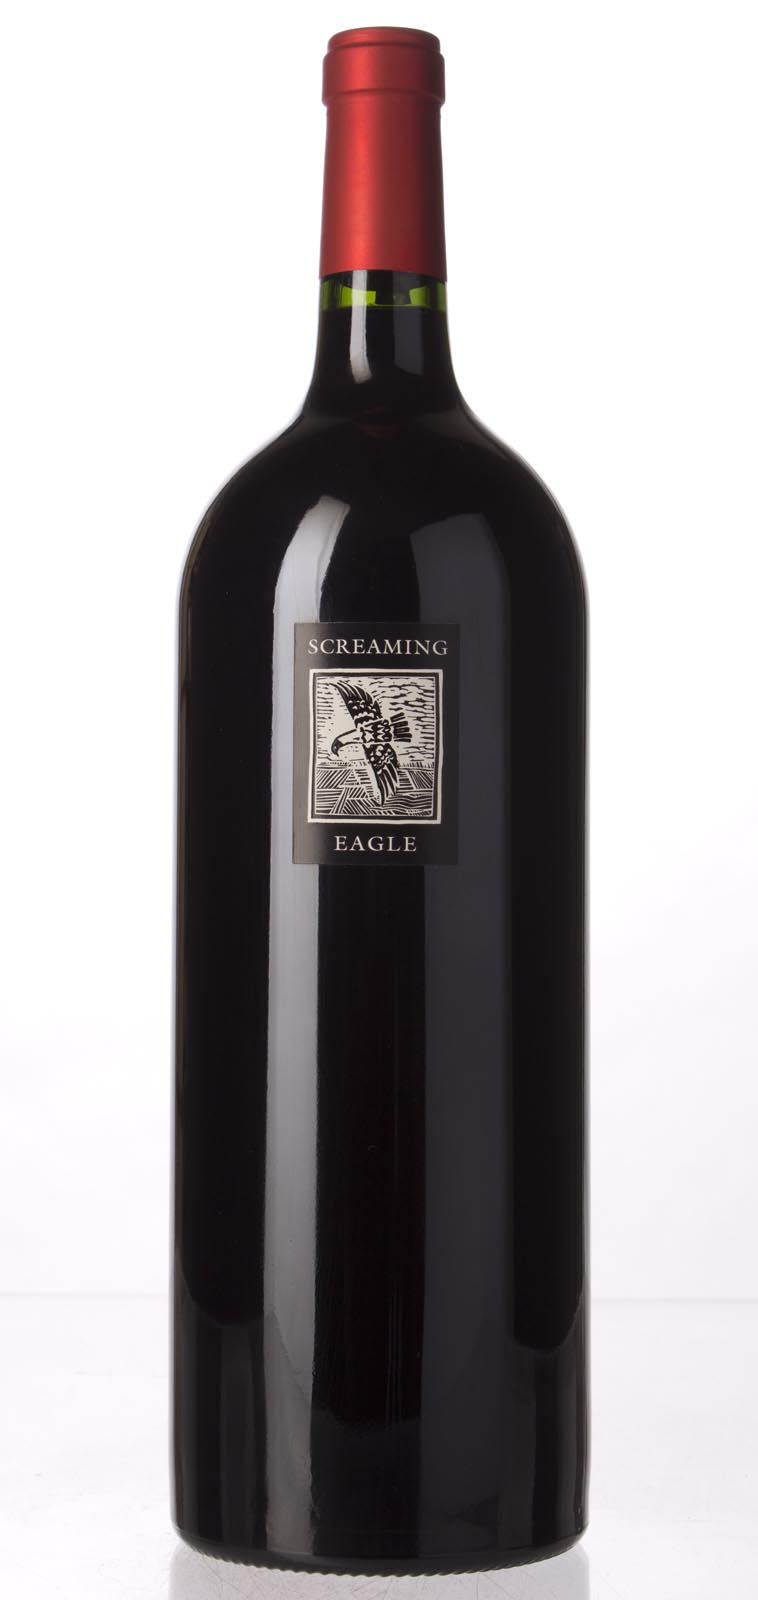 Screaming eagle wine label